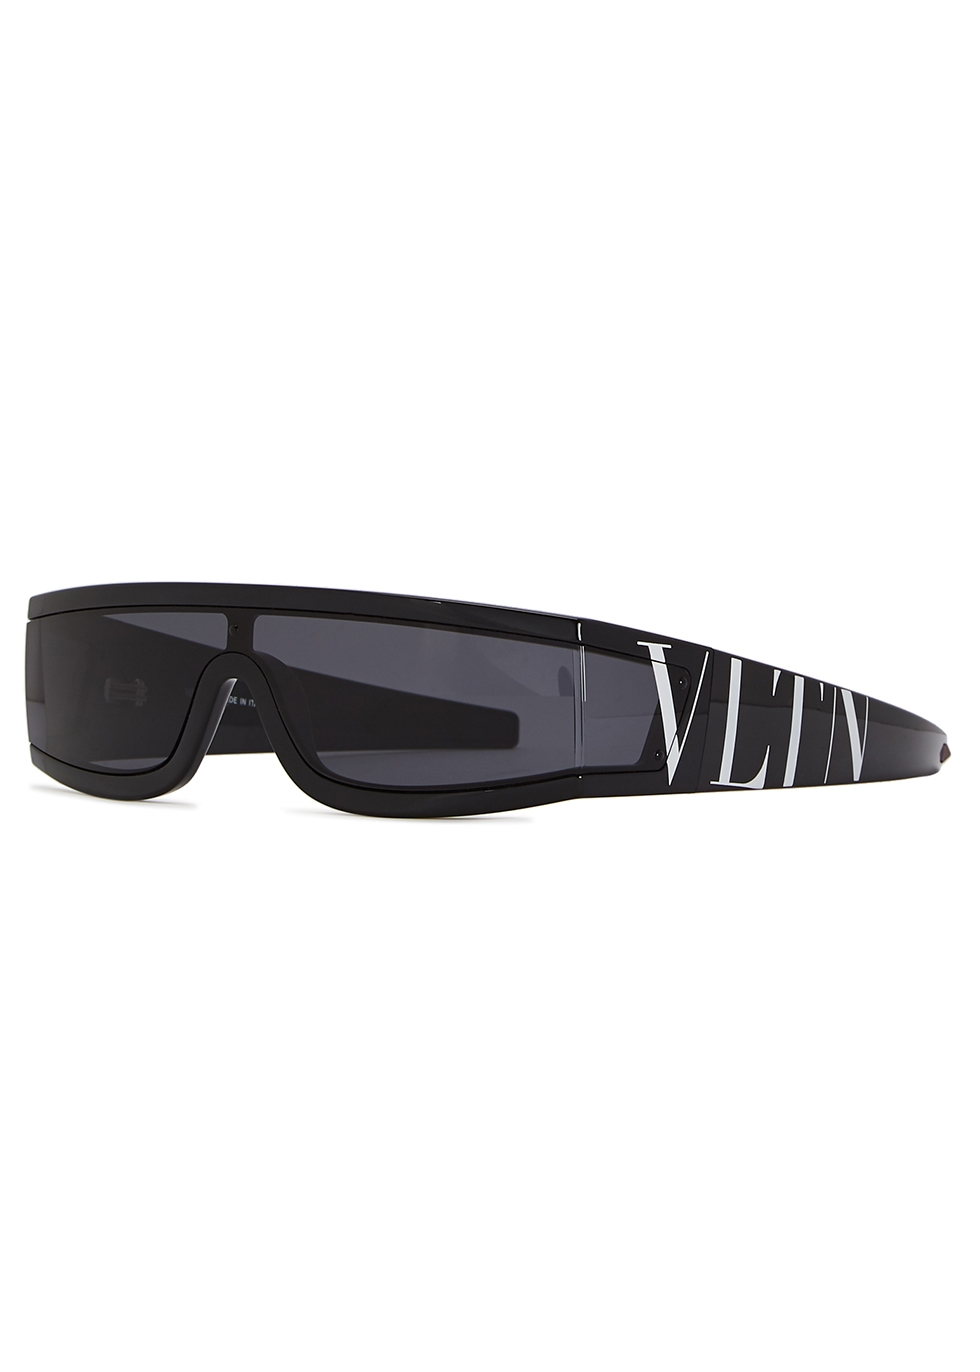 VALENTINO   Valentino Garavani Black Acetate Sunglasses   Goxip